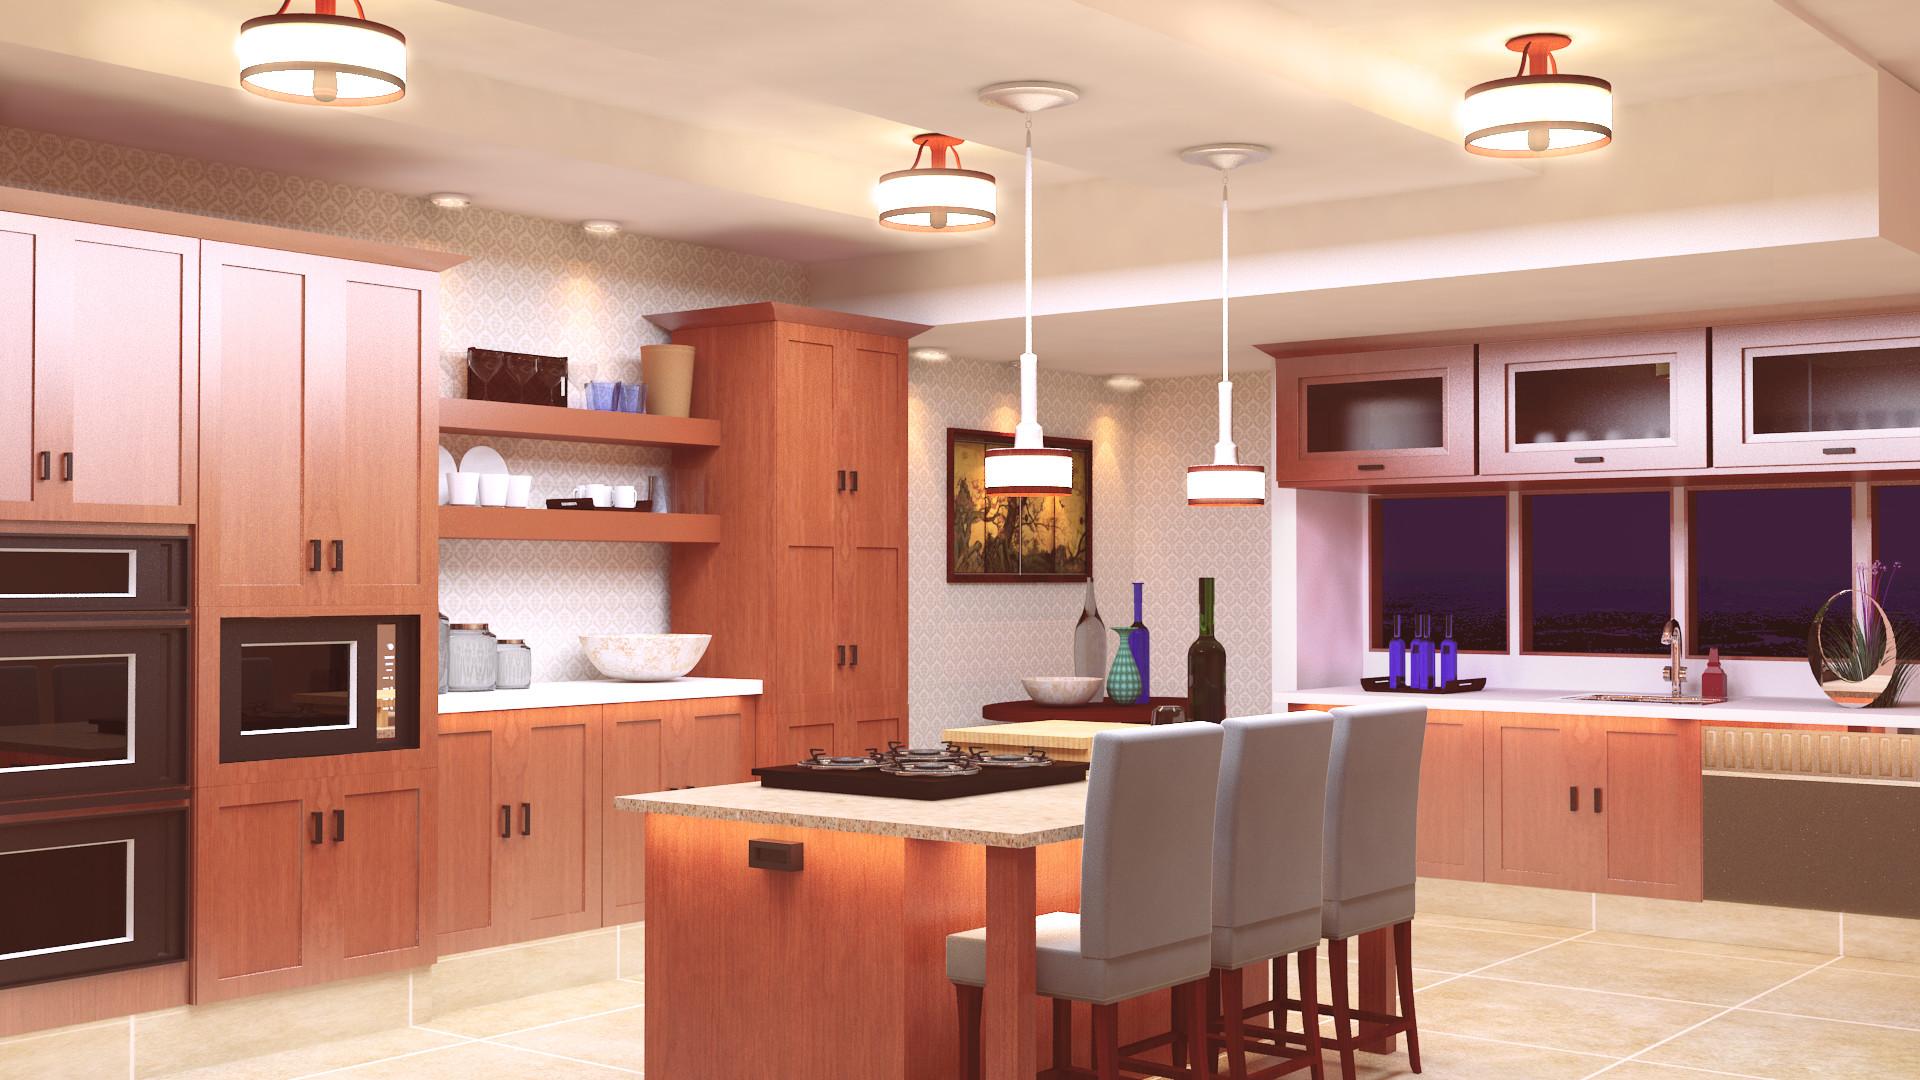 Umang Sharma - Archi Kitchen